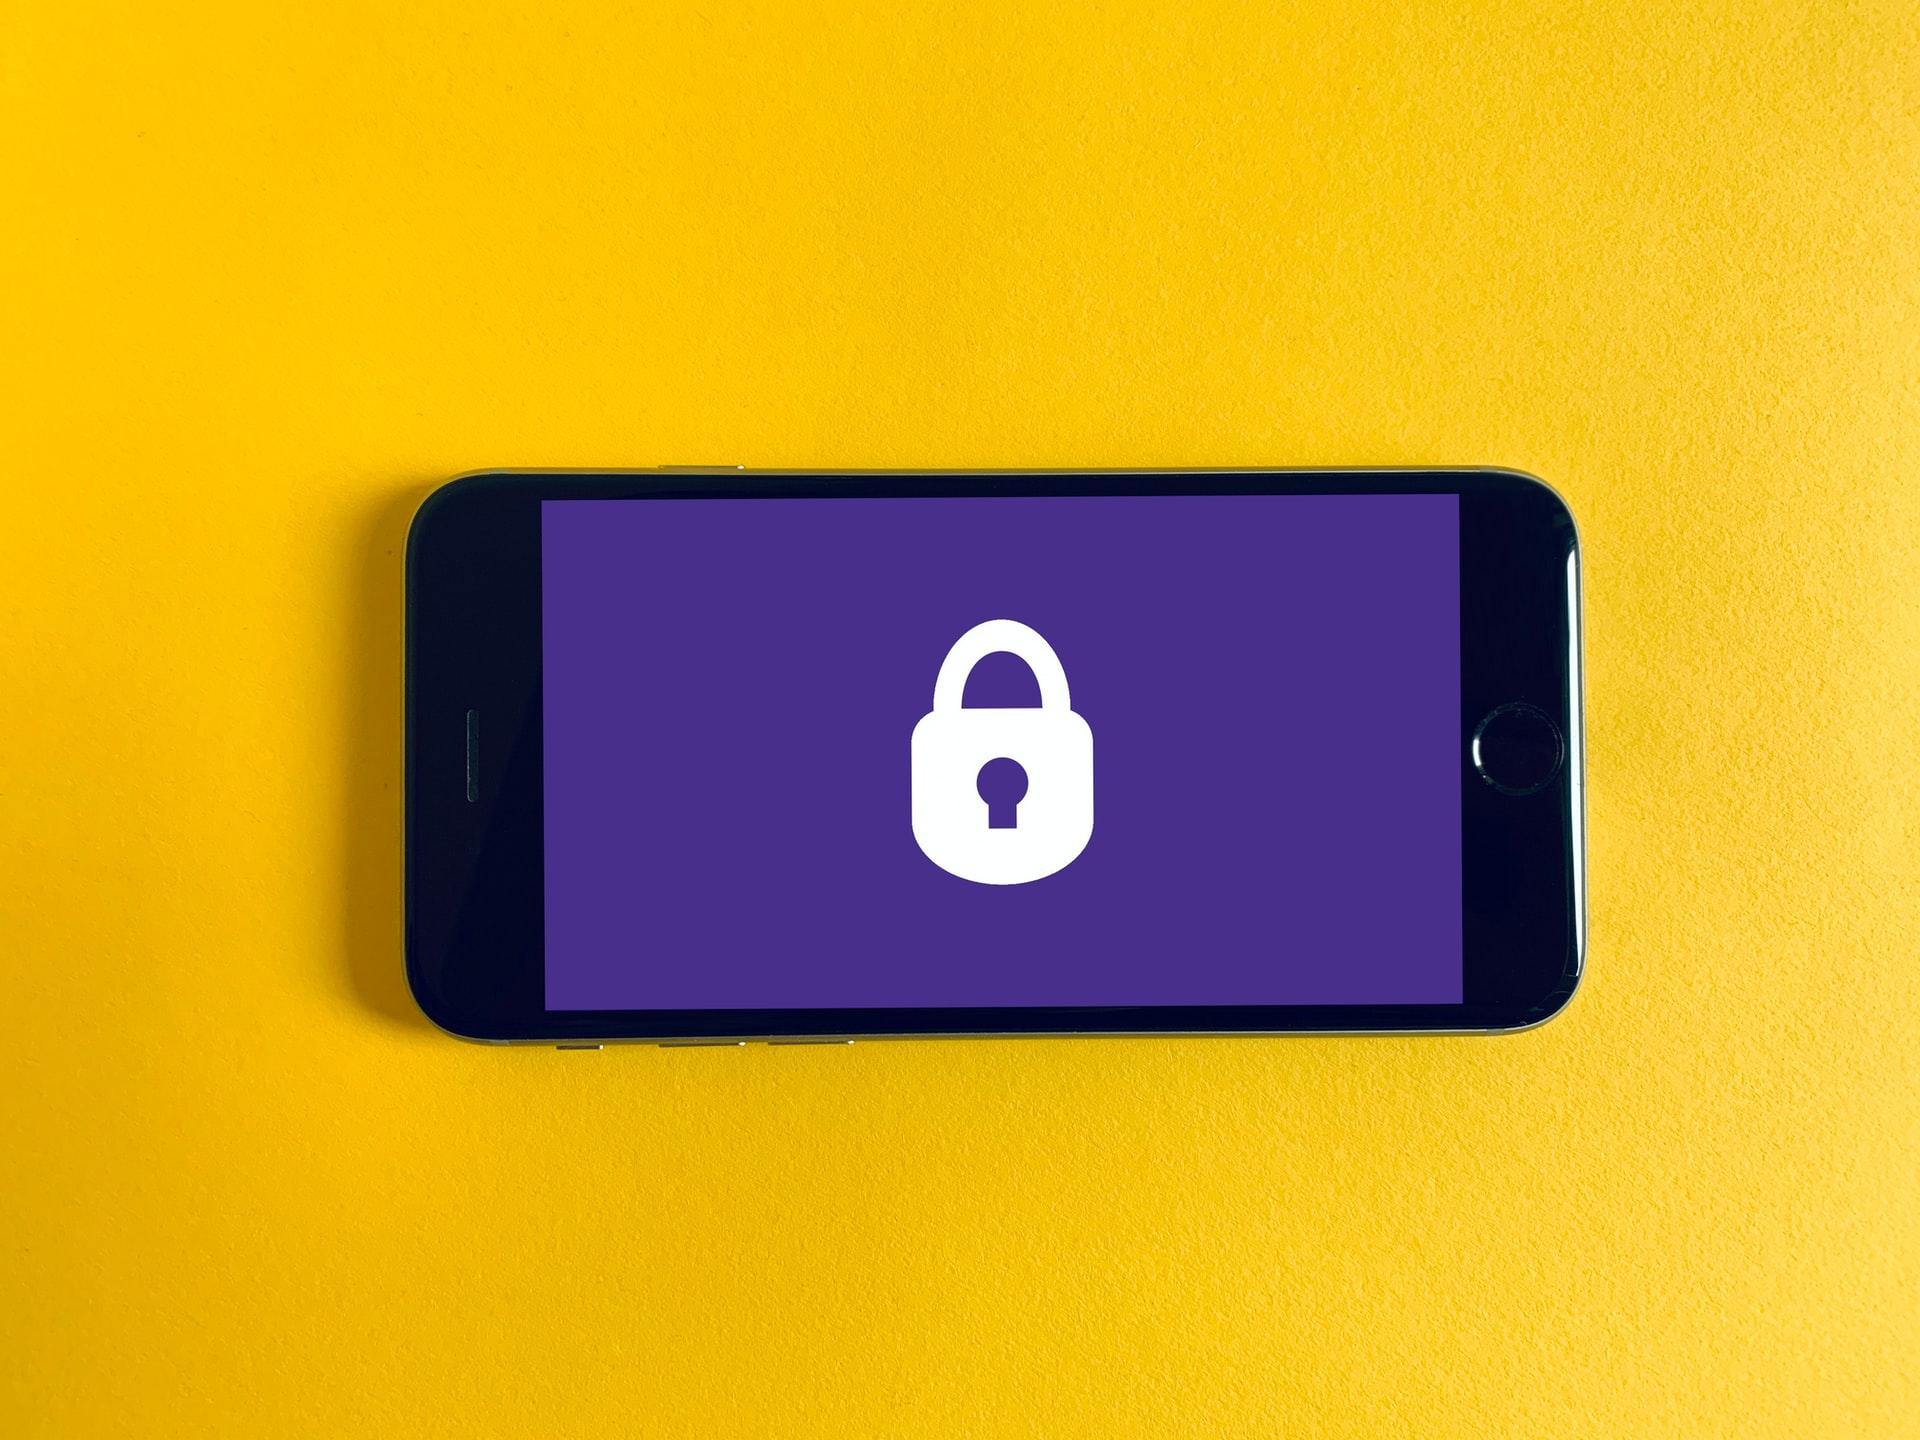 security logo on phone